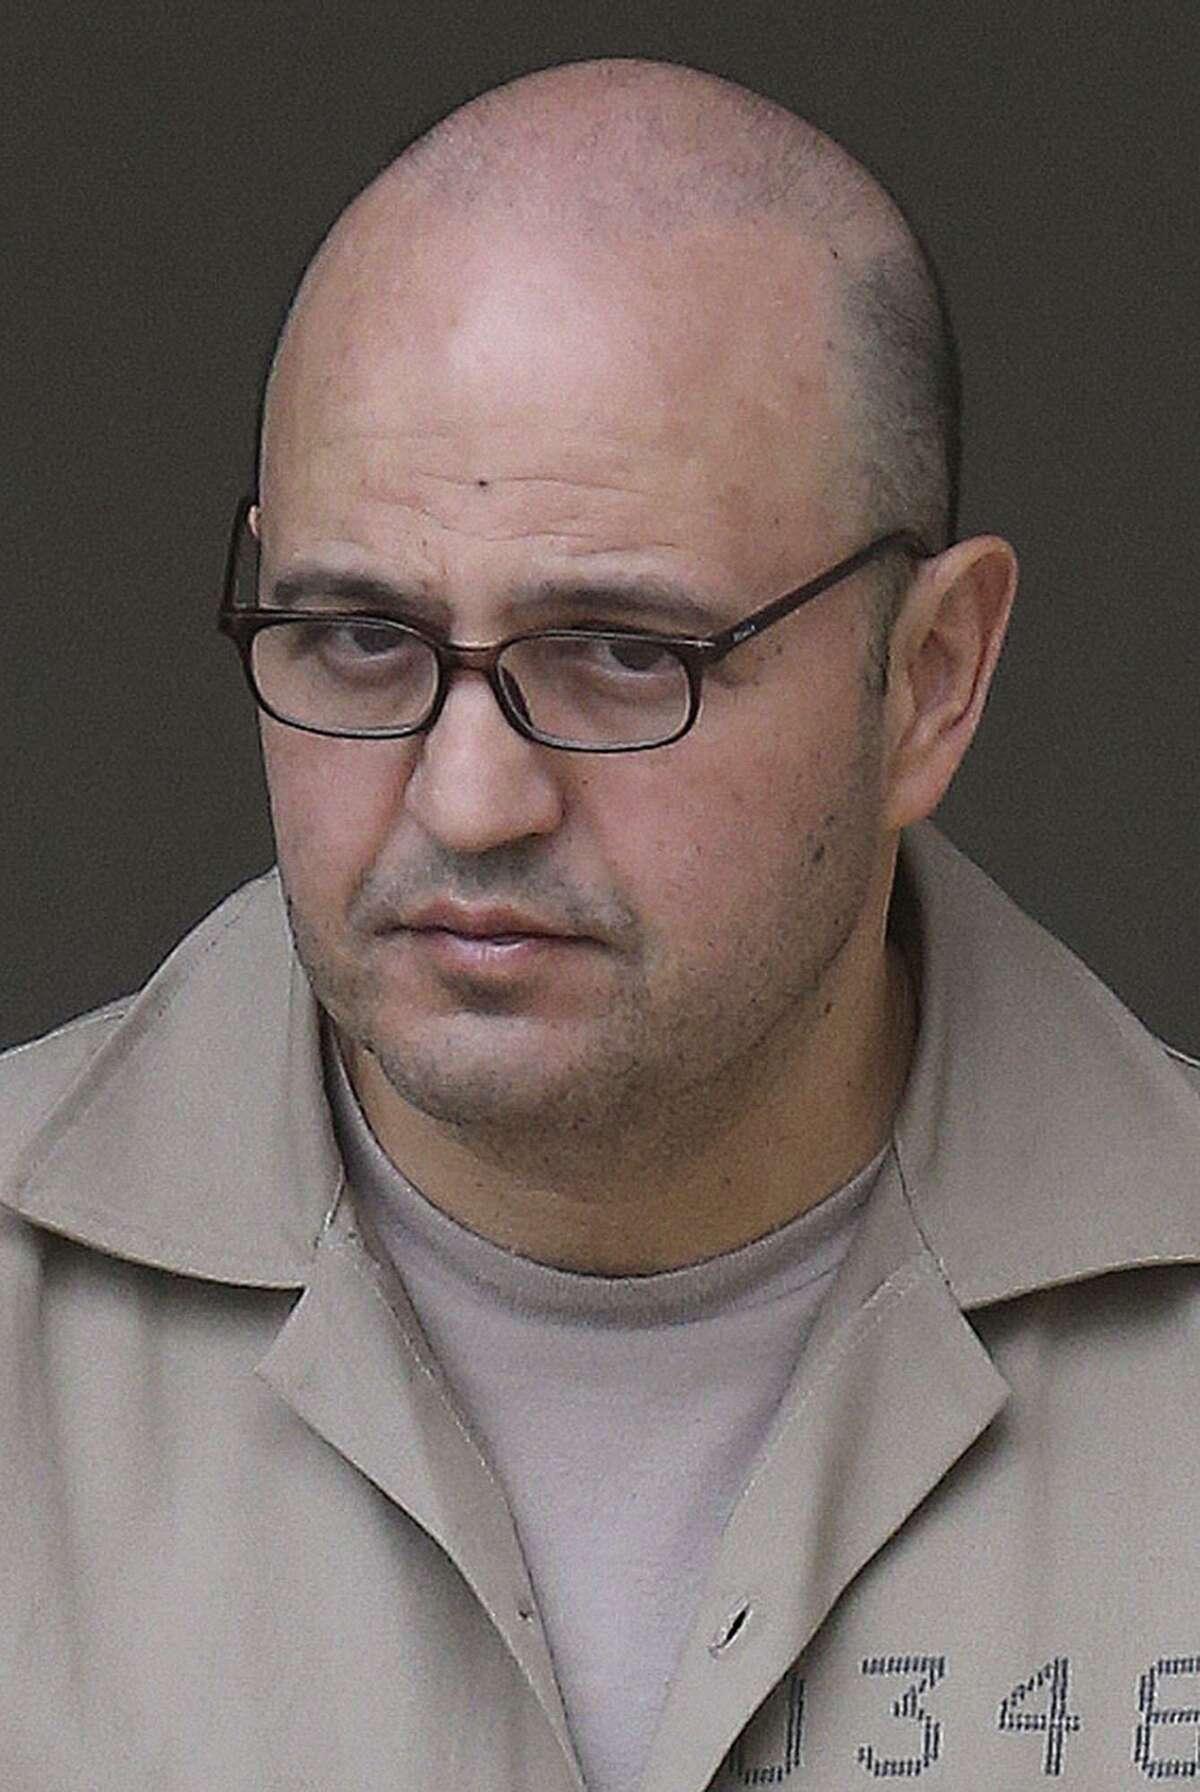 Mauricio Sánchez Garza, 45, was accused of laundering money through a Babcock Road development.